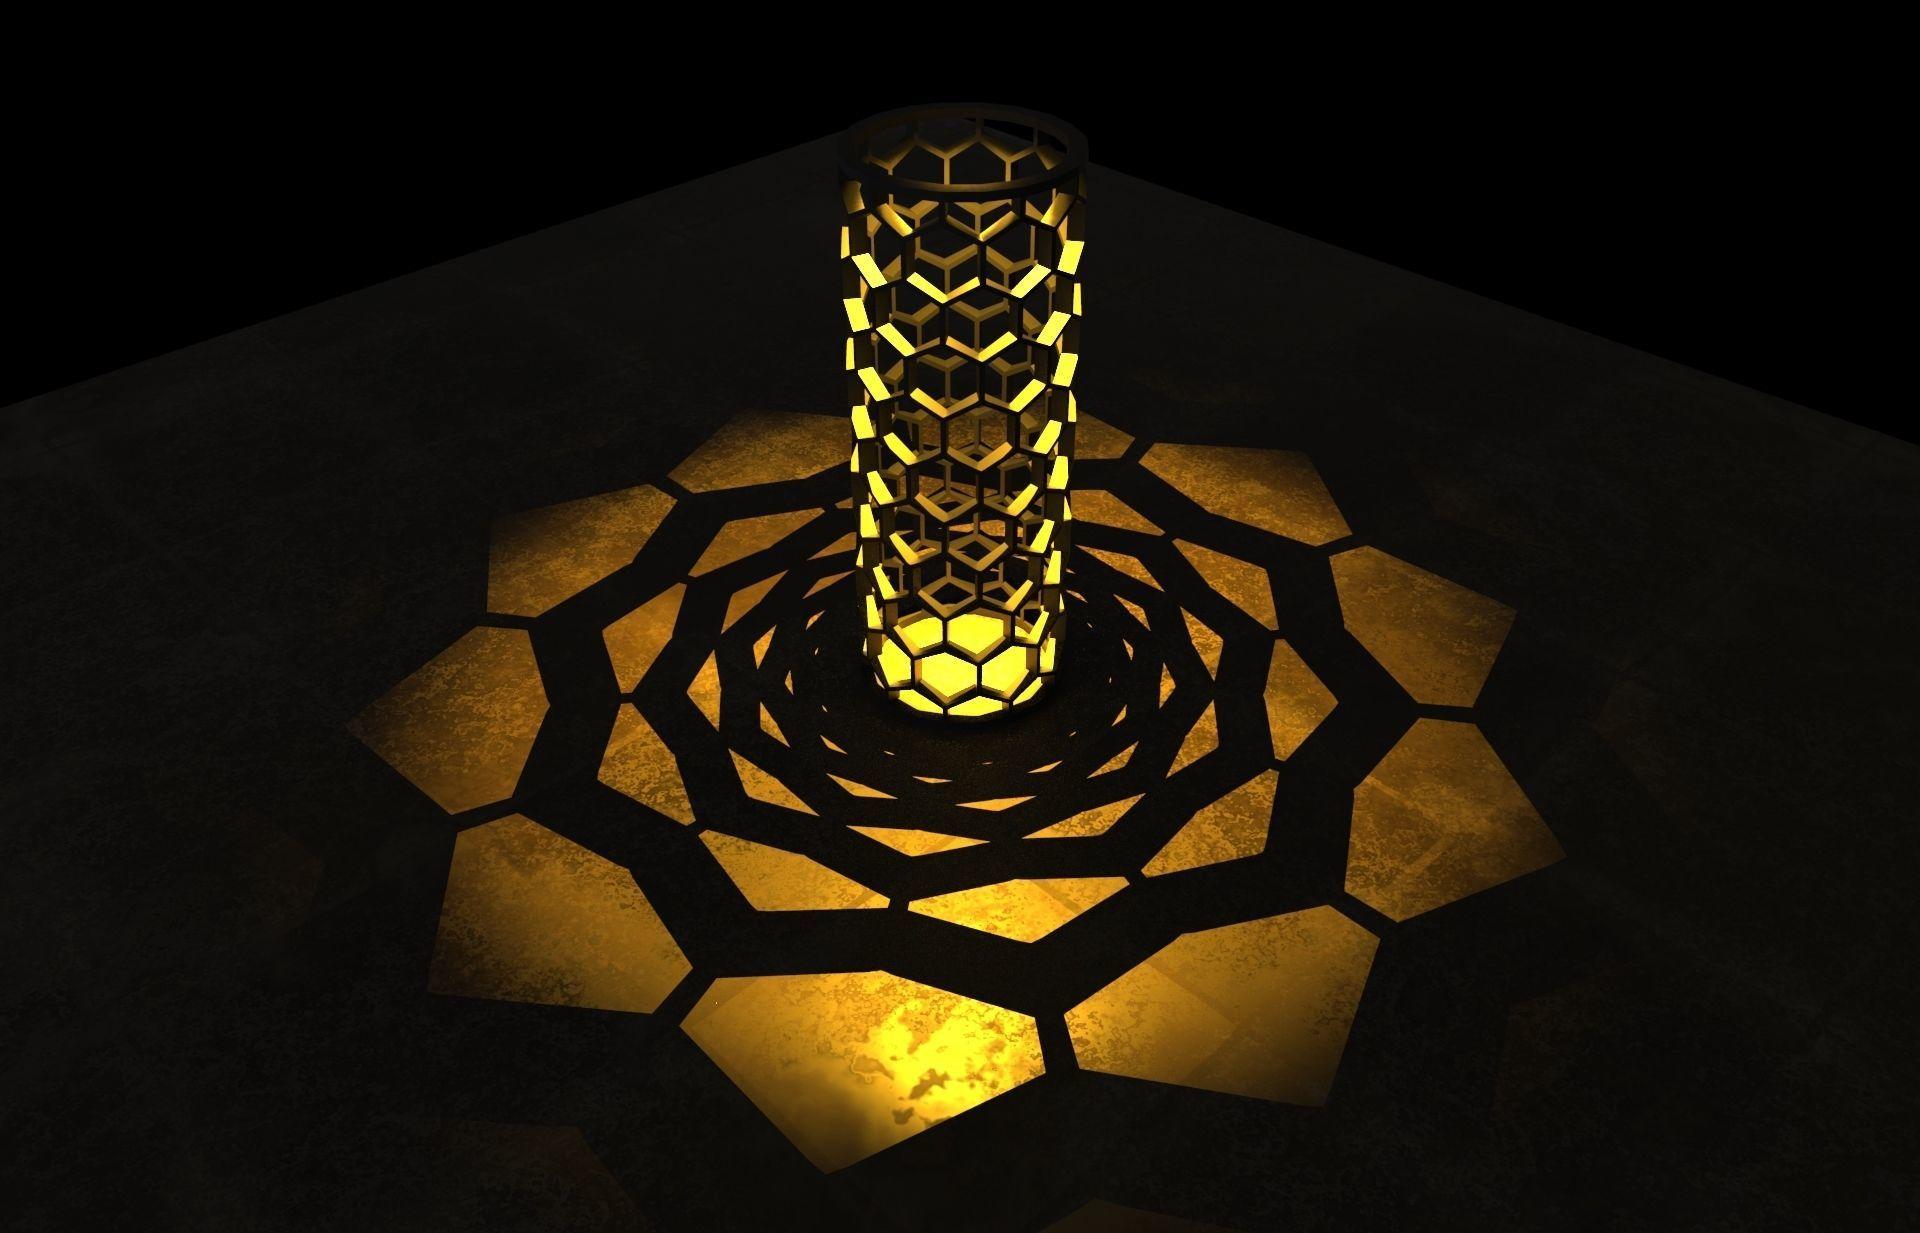 Honeycomb shaped Candle shade